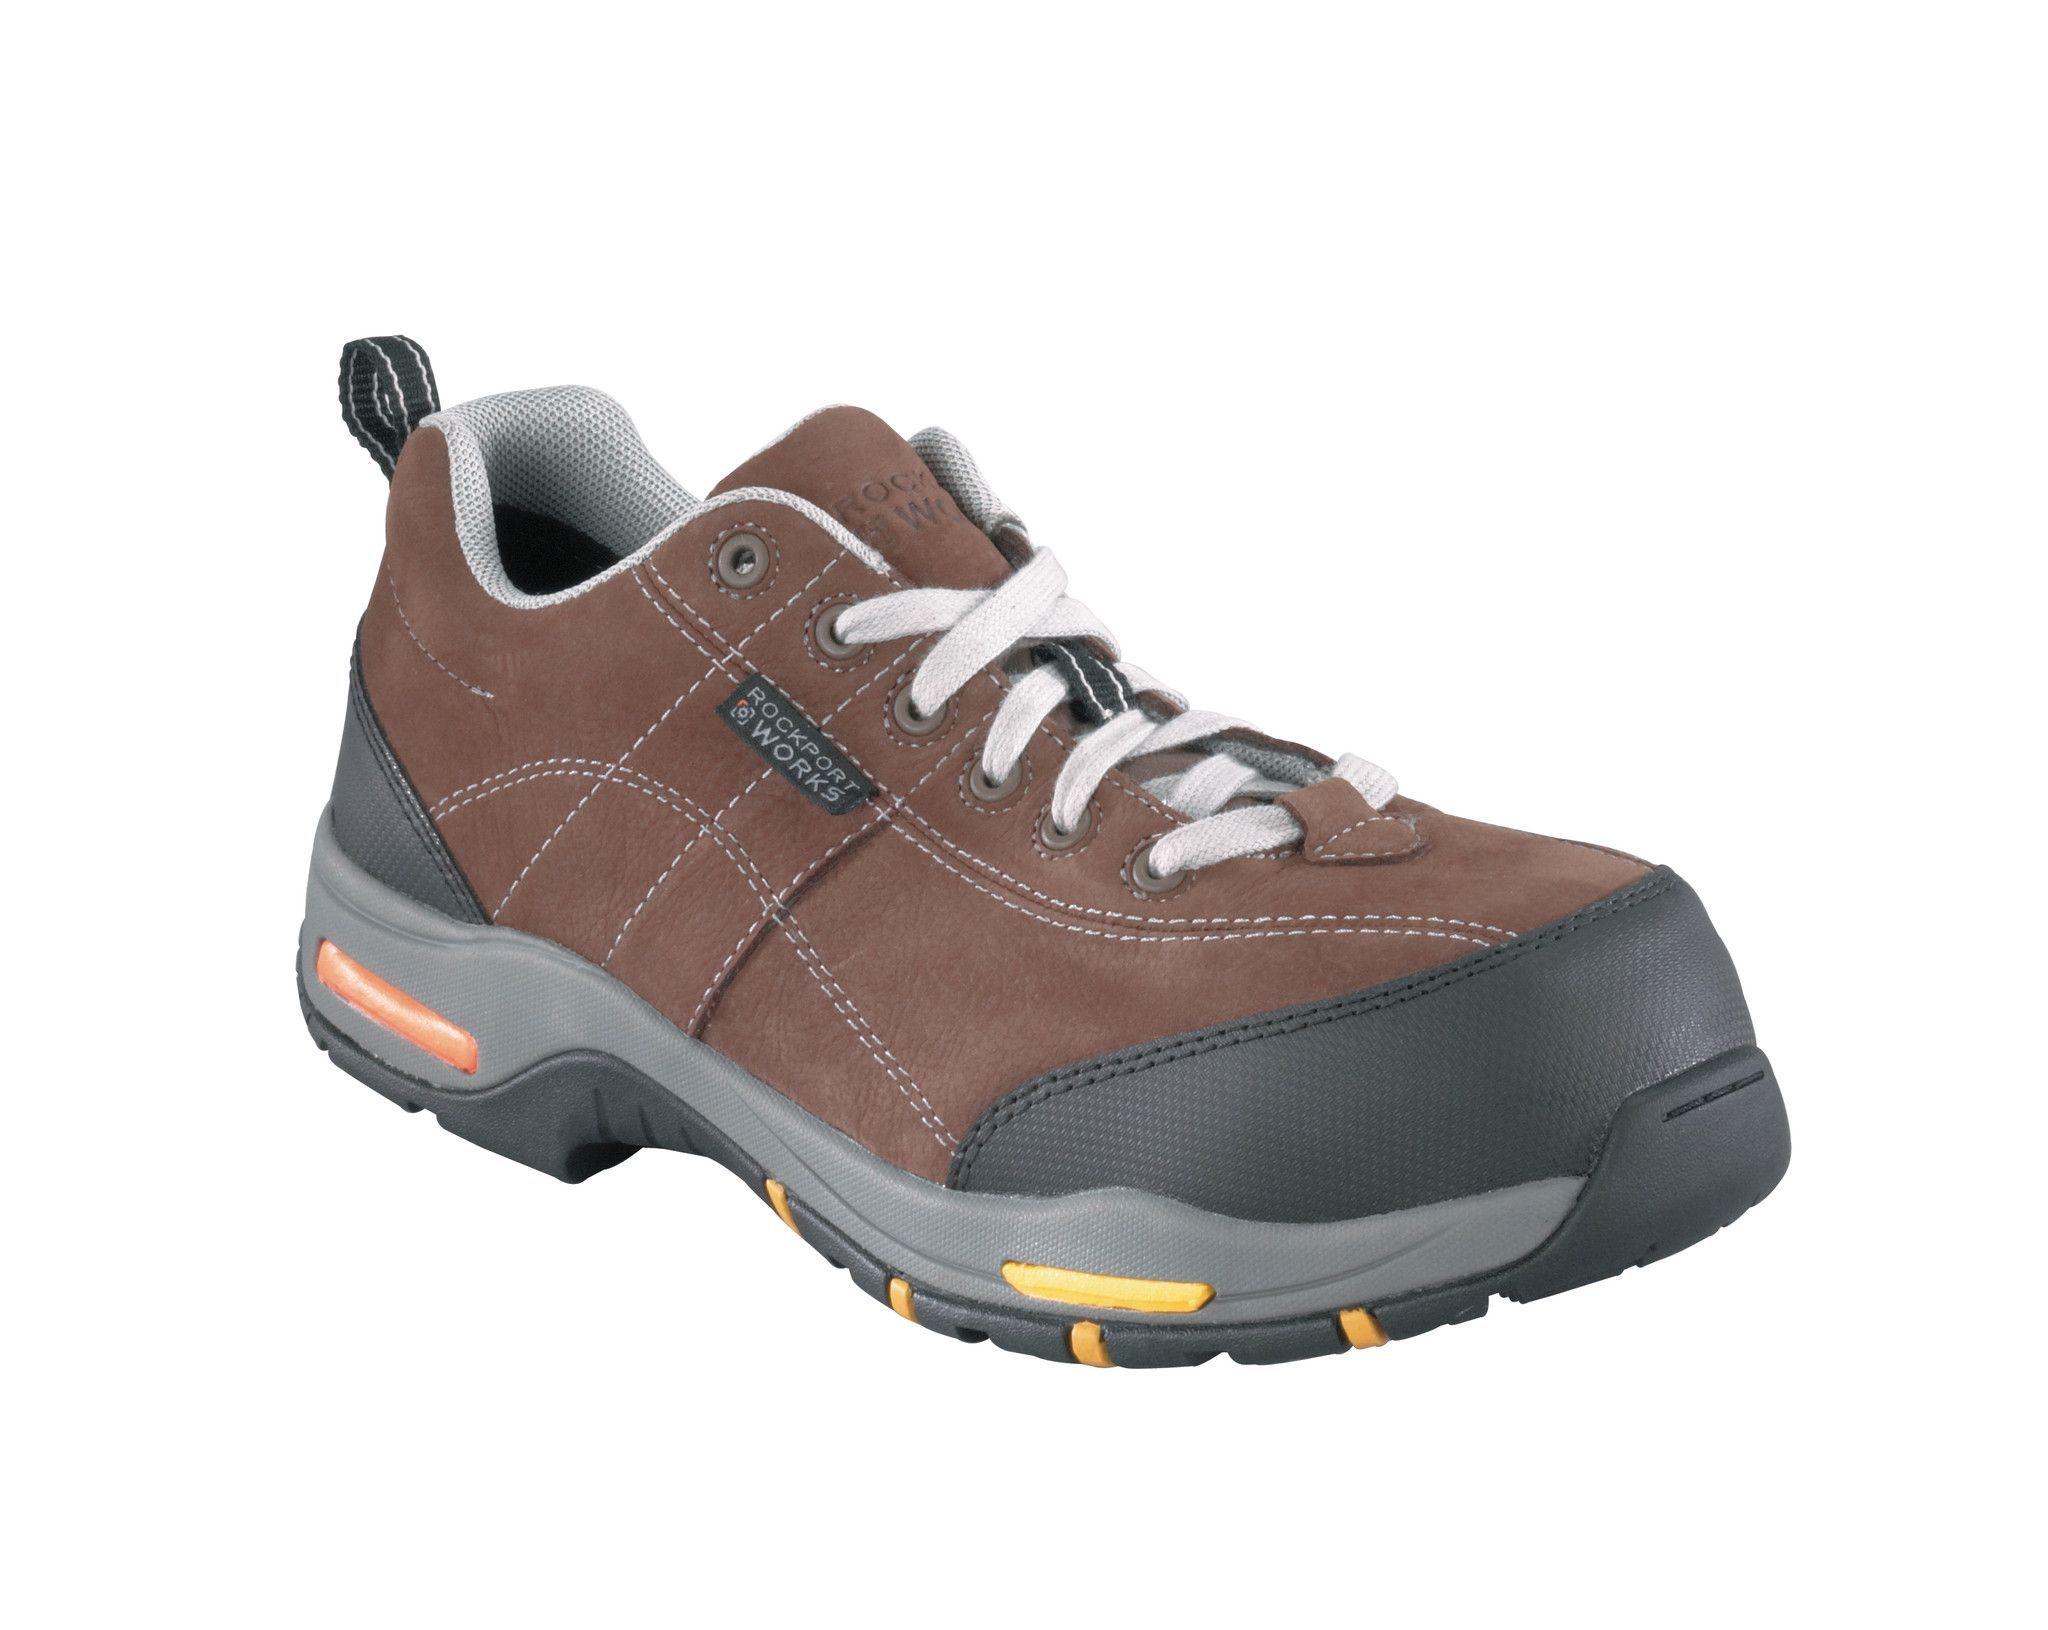 Rockport Mens Brown Black Leather Sport Oxford Propel Composite Toe